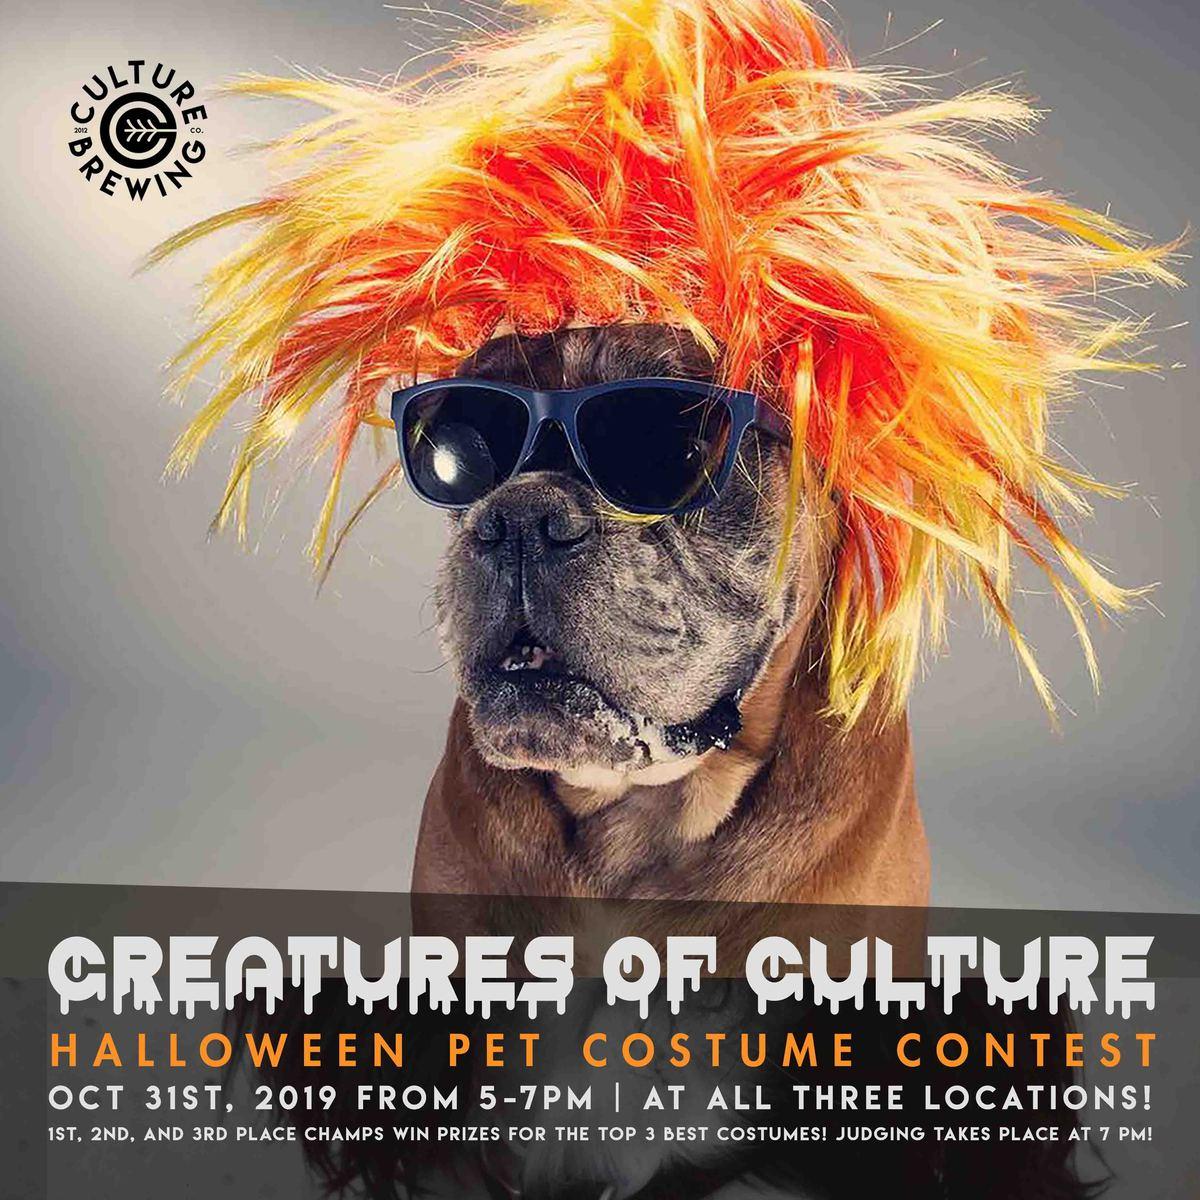 Ocean Beach News Article: CREATURES OF CULTURE - HALLOWEEN PET COSTUME CONTEST, OCTOBER 31ST!